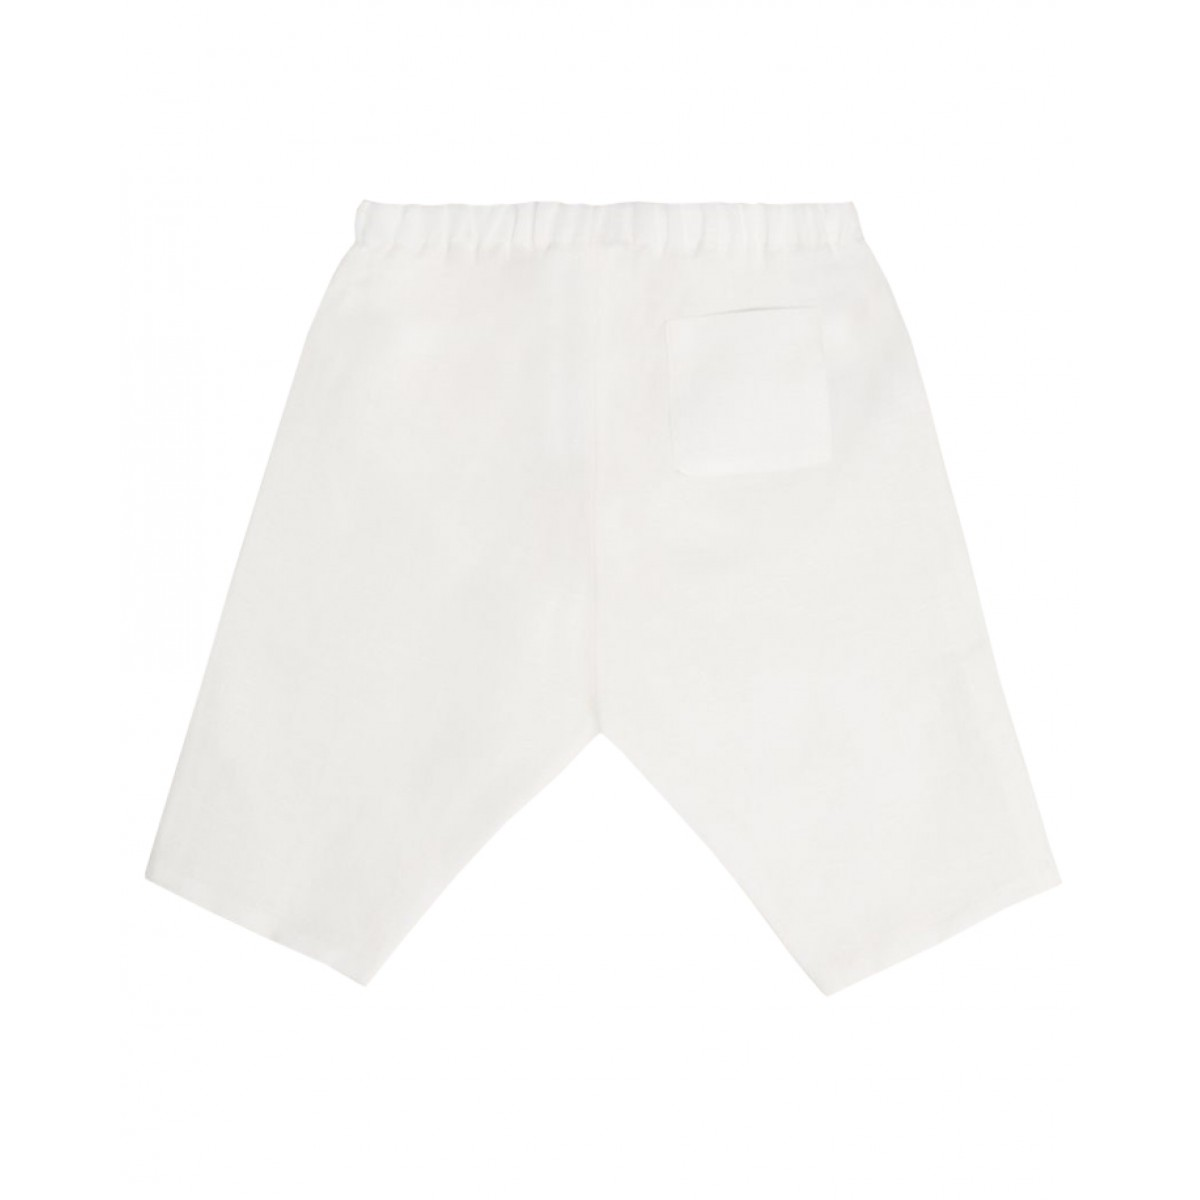 BONPOINT Milky white linen pants